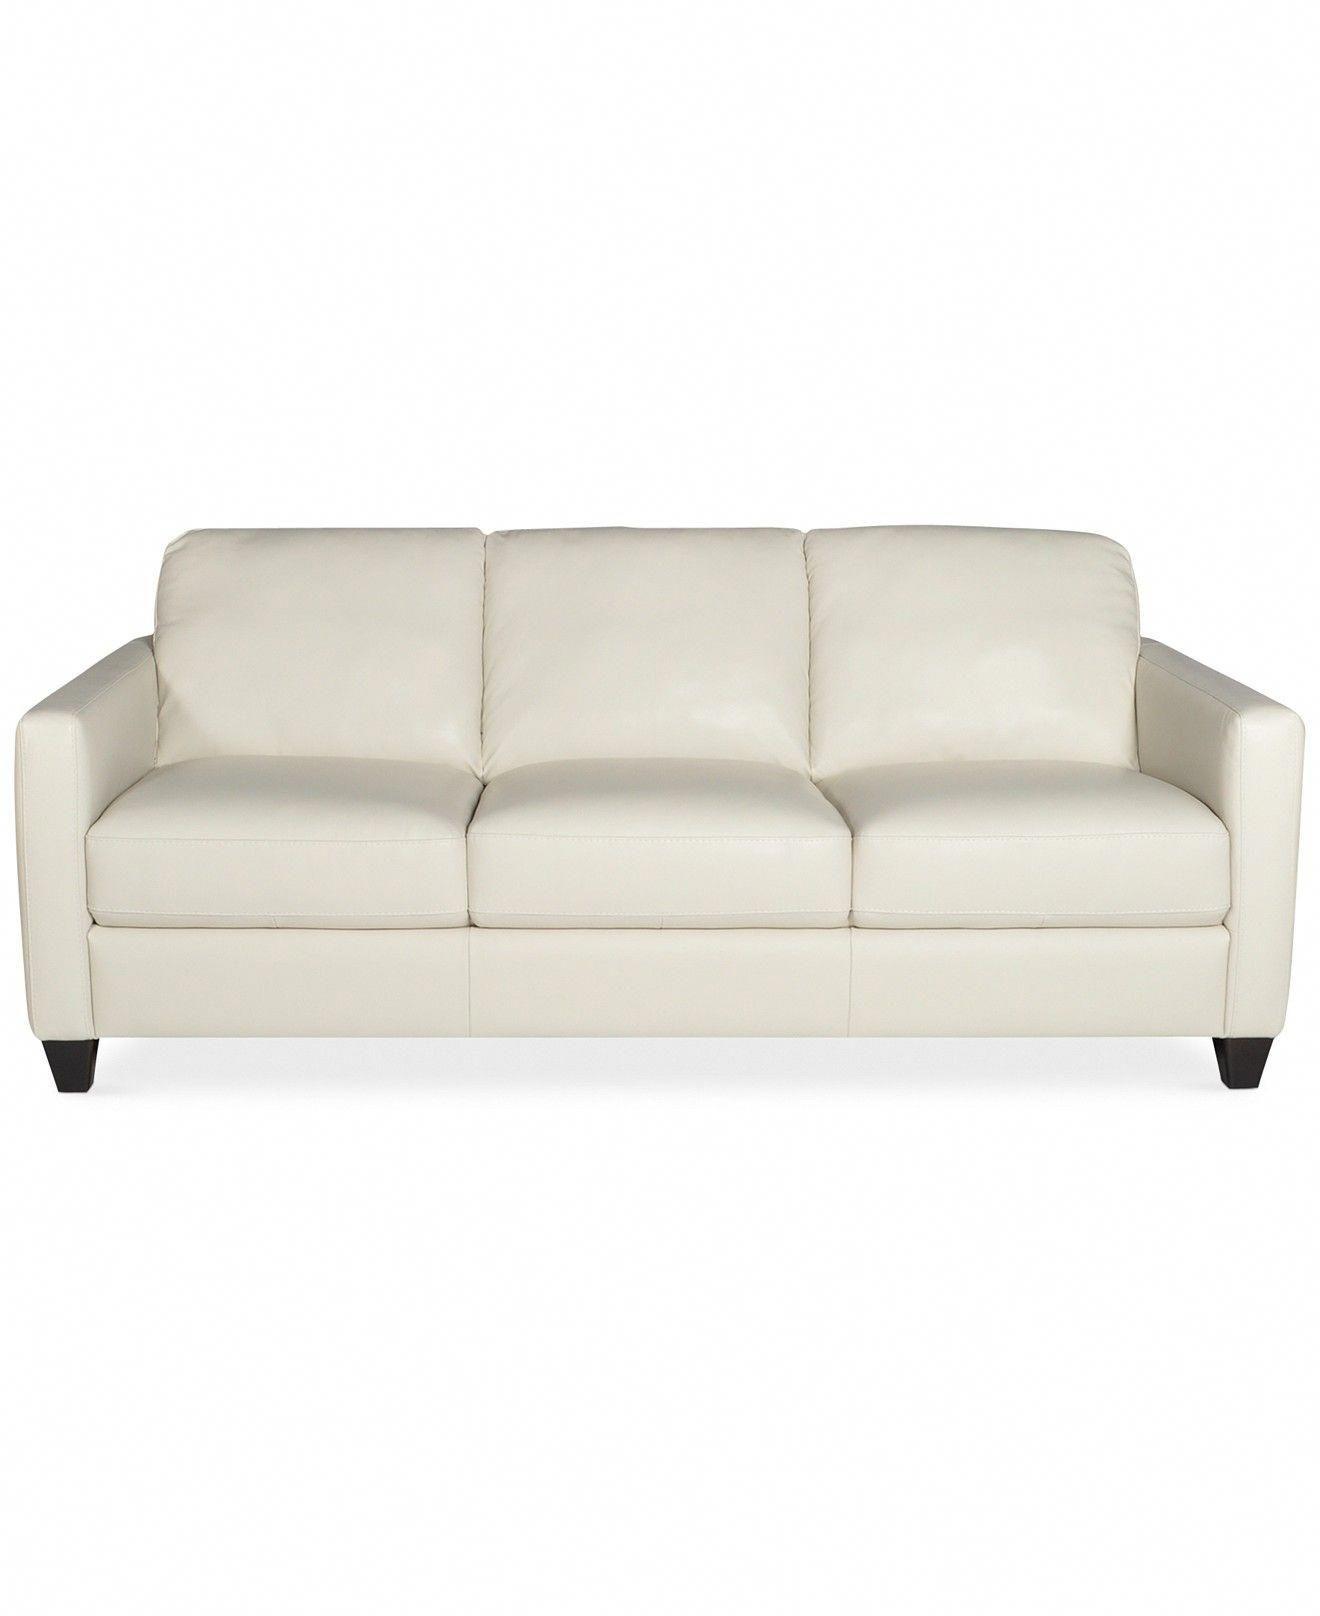 Macy S Furniture Black Leather Sofa Www Resnooze Com